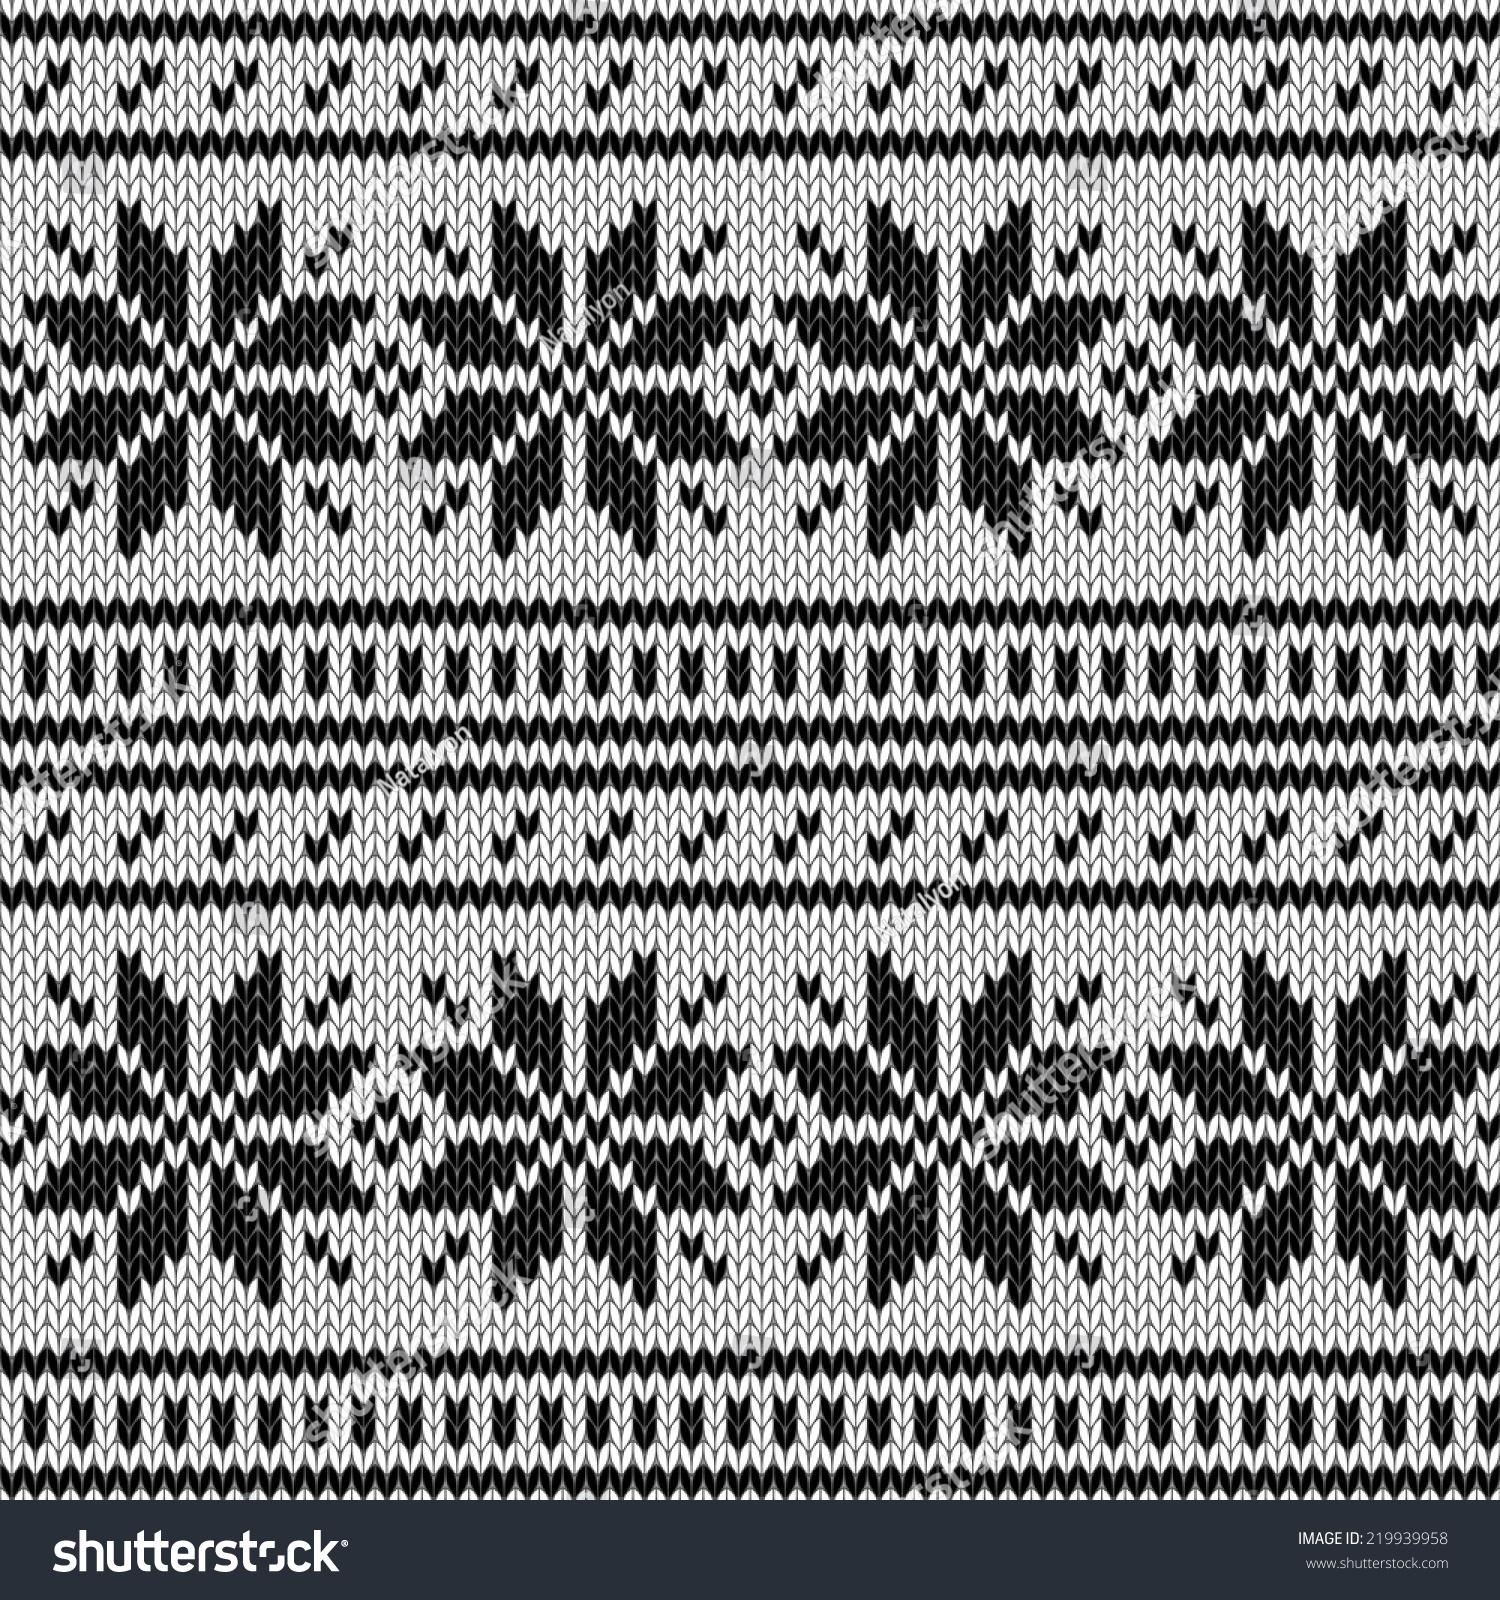 Scandinavian Knitted Sweater Geometric Seamless Pattern Stock Vector ...